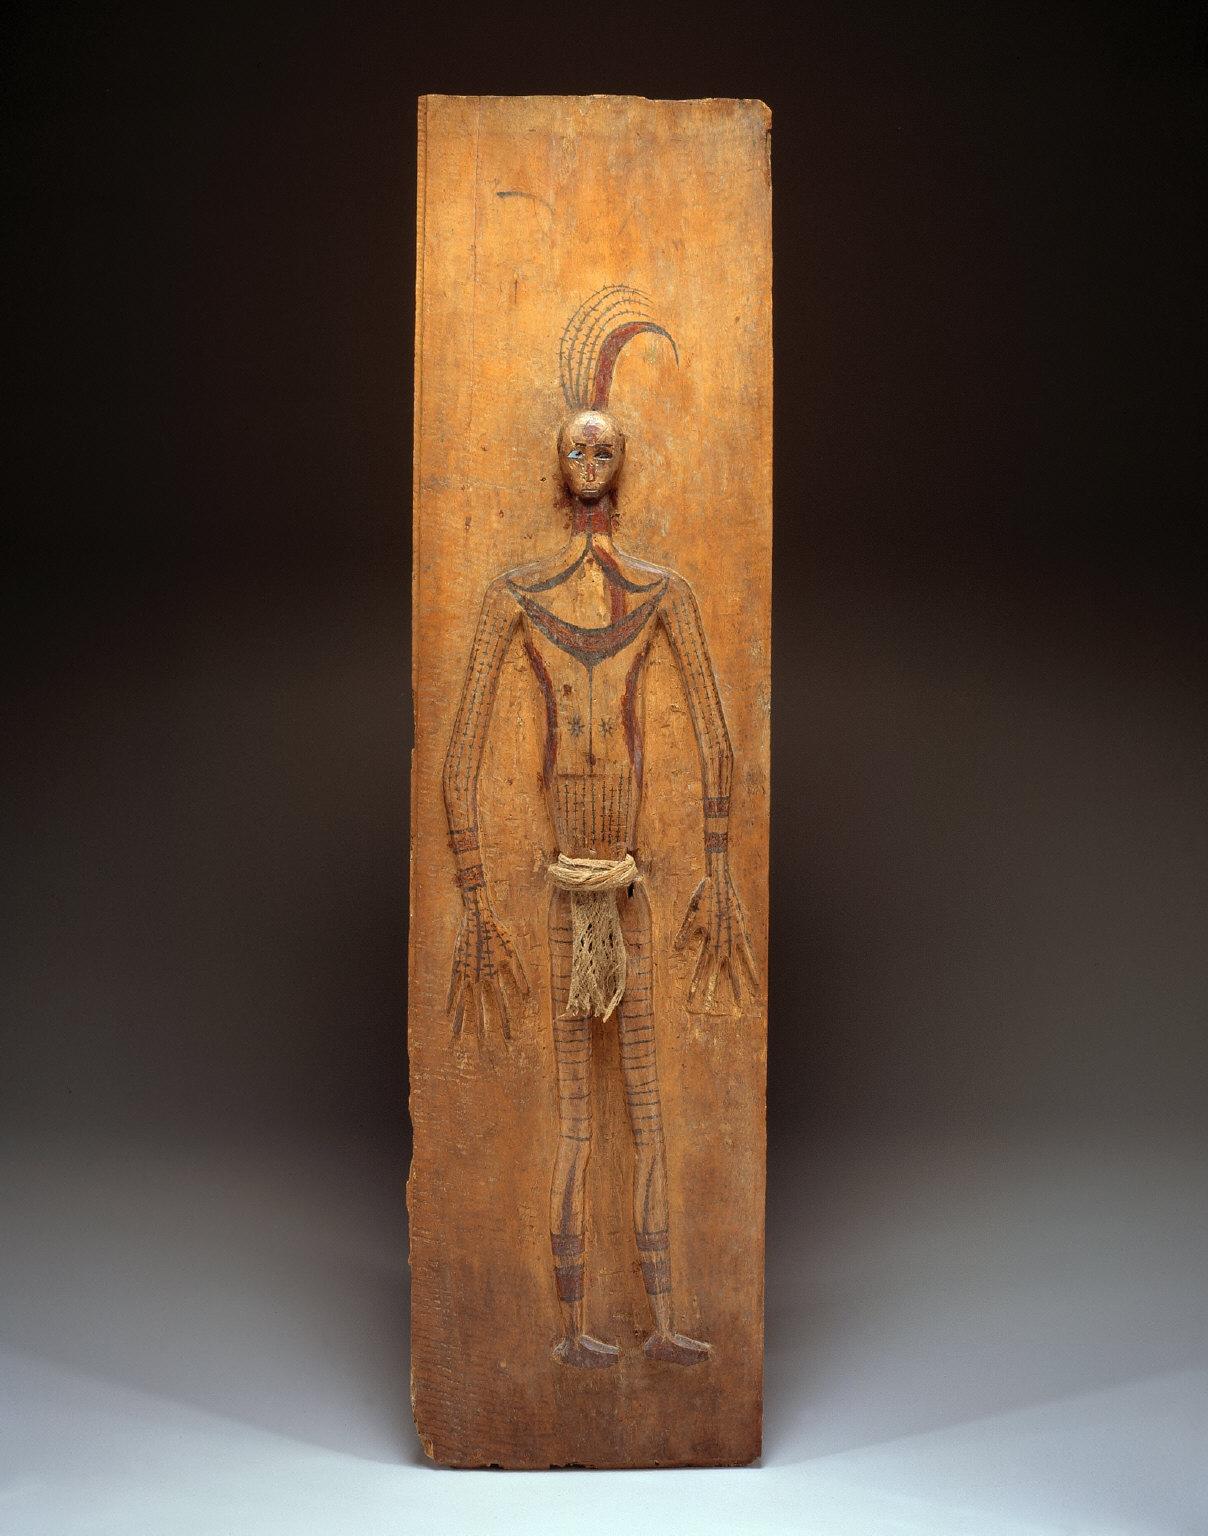 Wall panel with figure of a slain shaman (tulangan sirimanua)